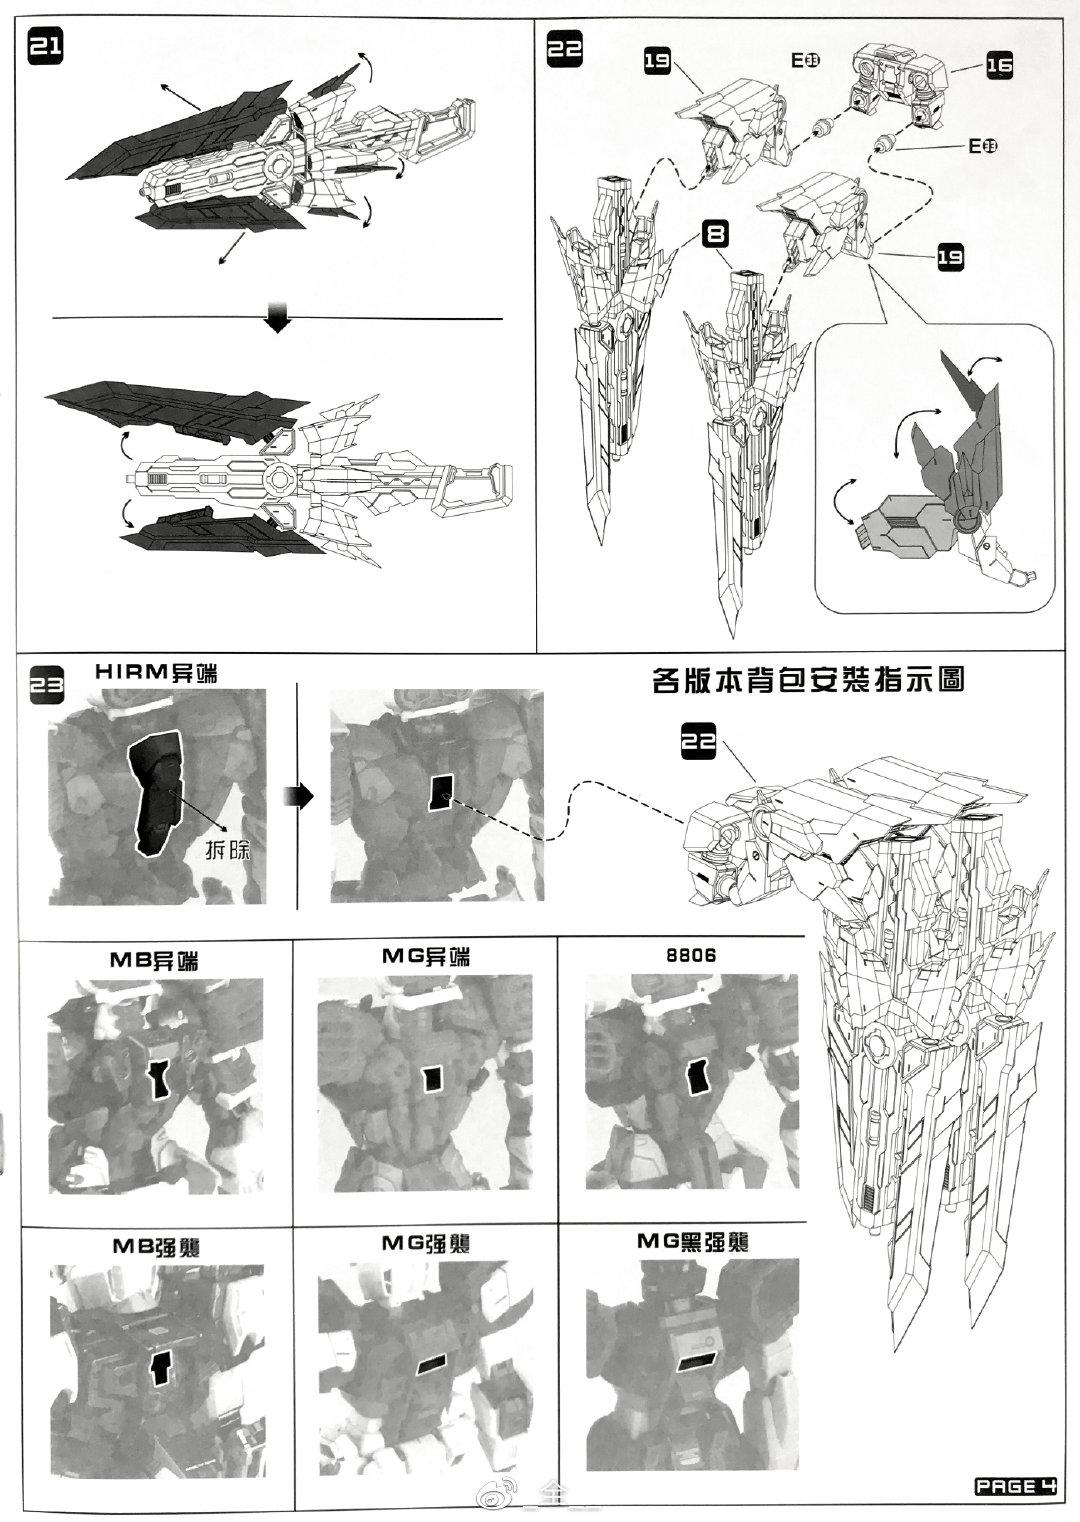 S543_1_astray_mg_dragon_king_sword_014.jpg